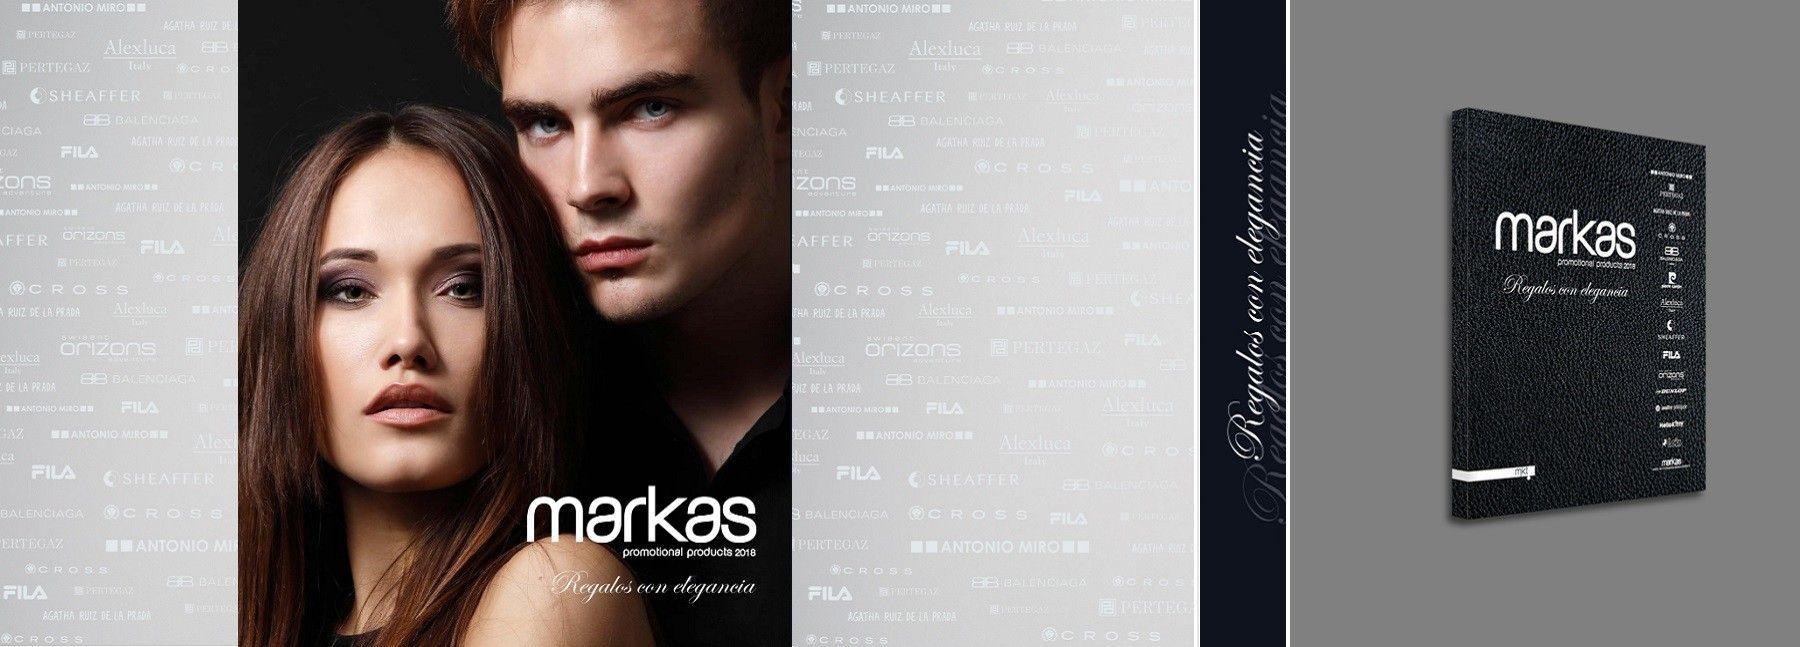 Catálogo Markas